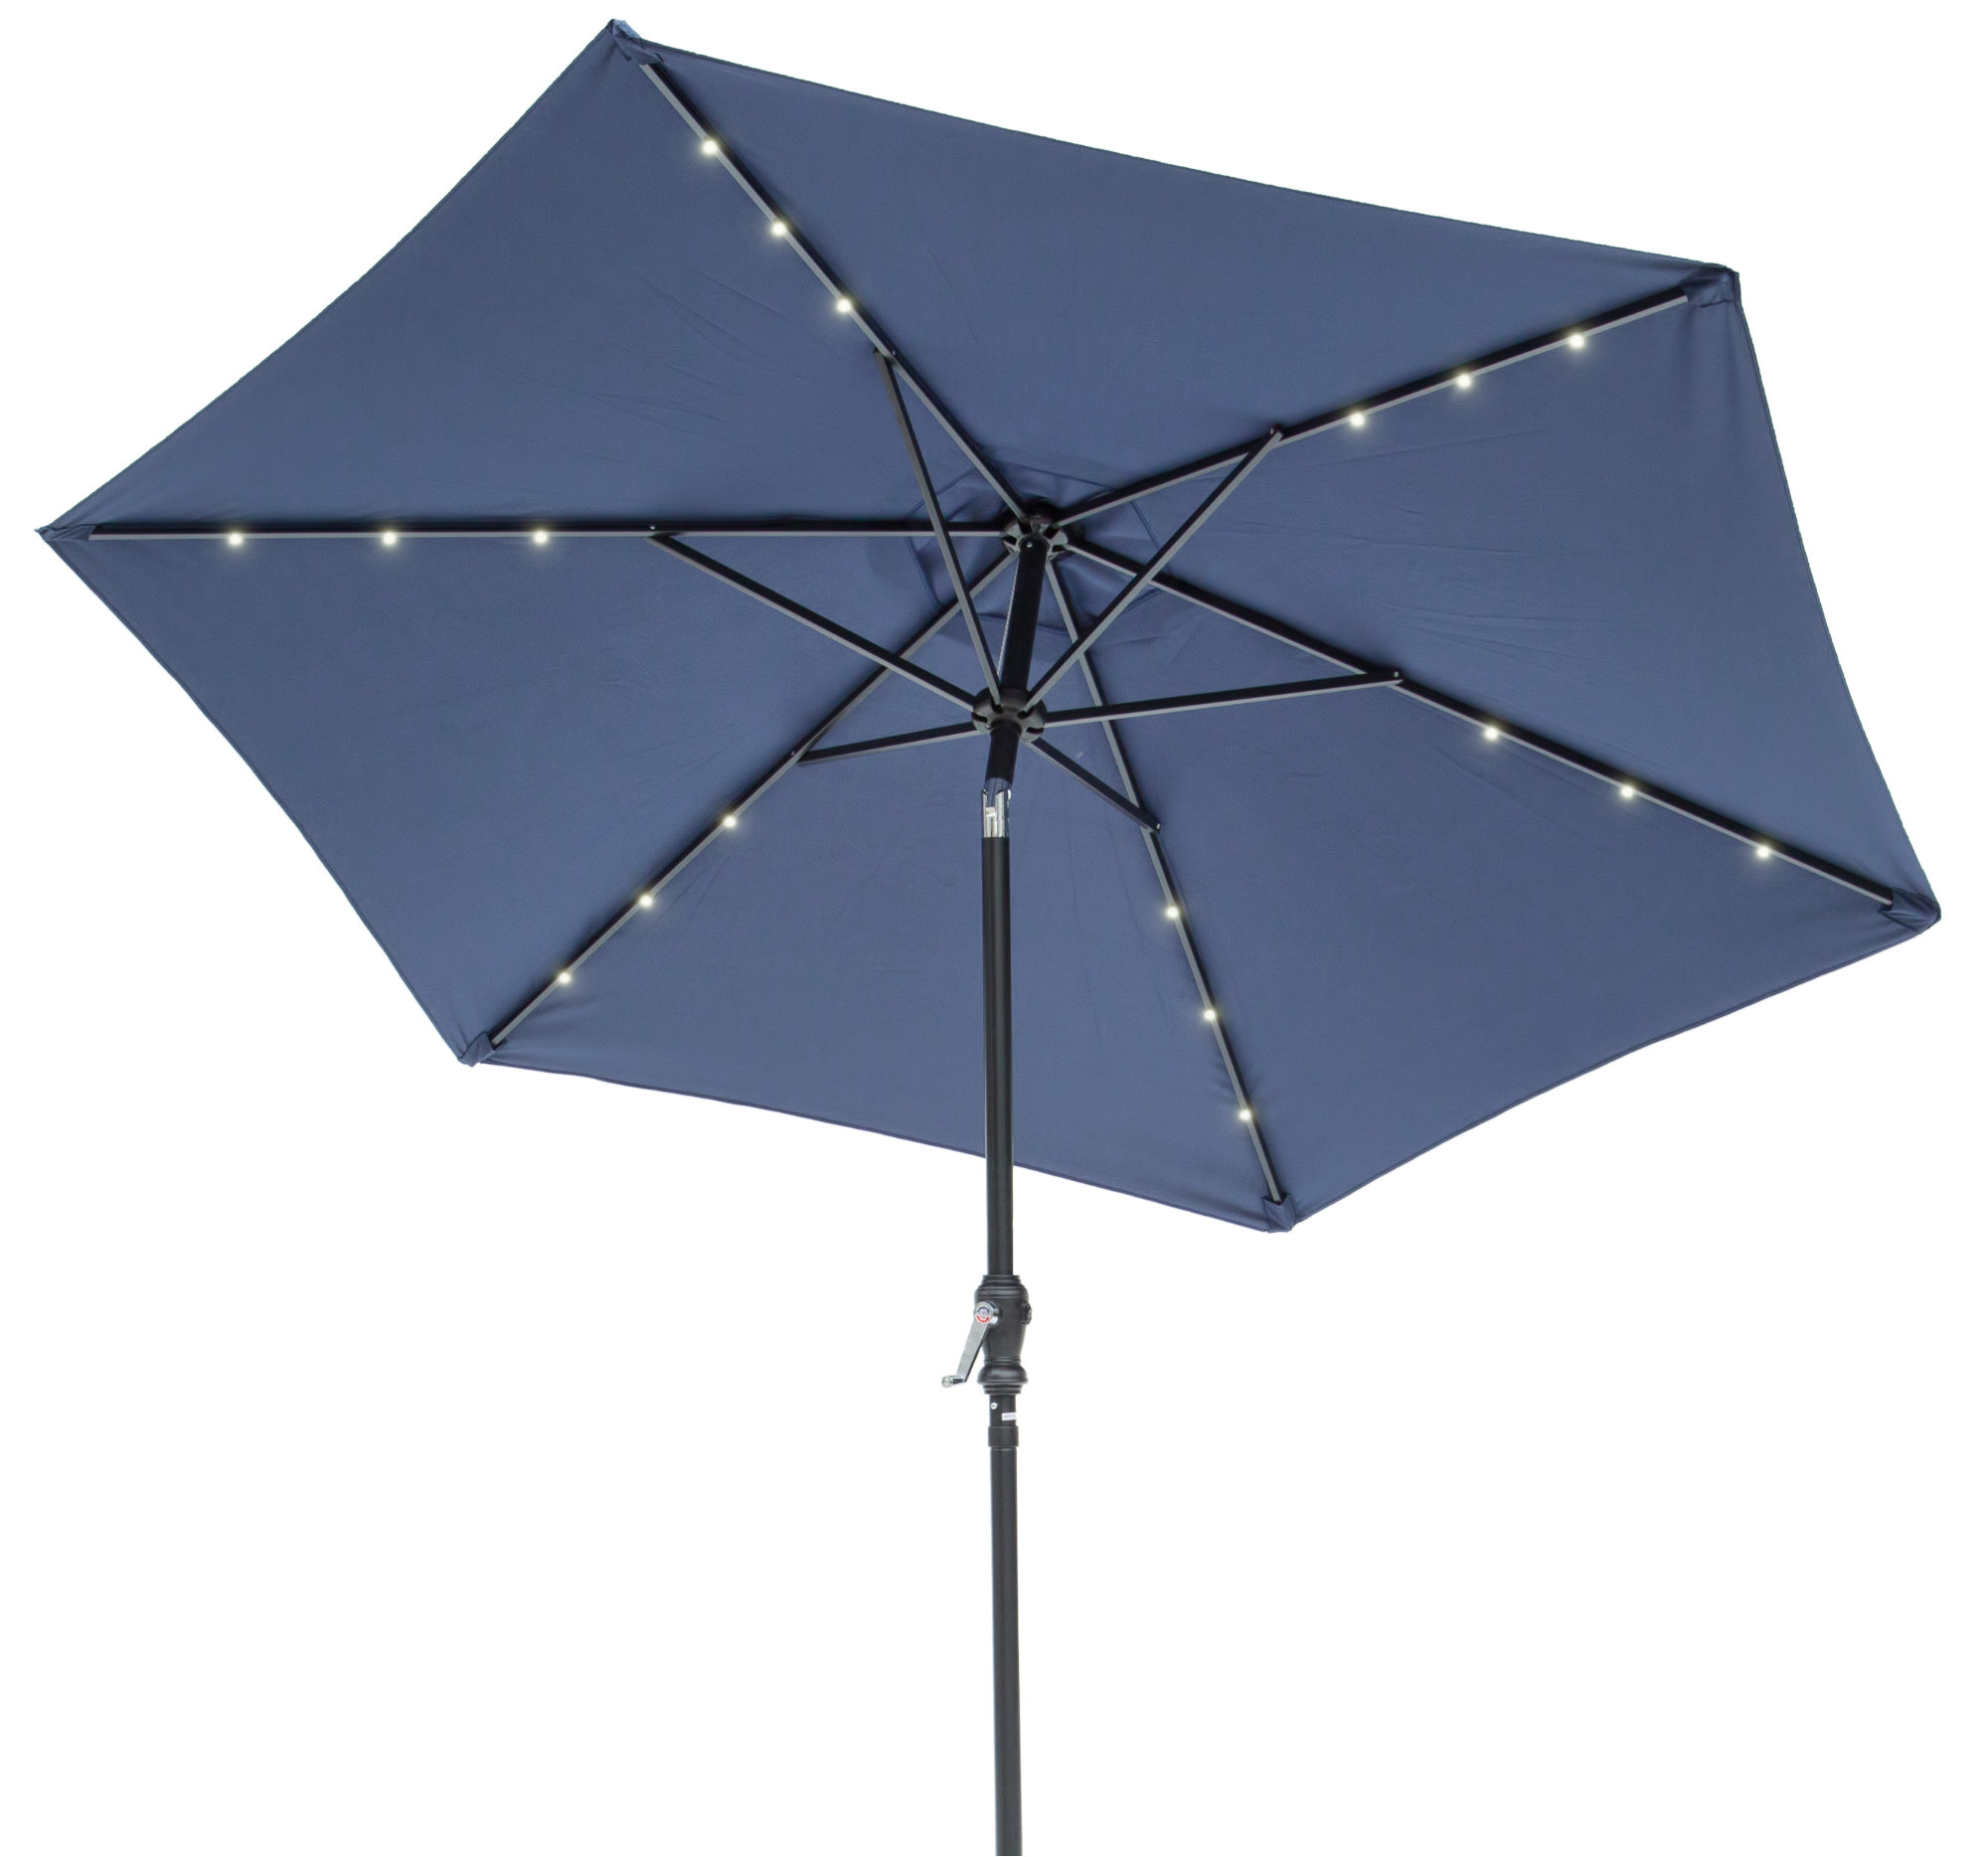 Branscum Lighted Umbrellas Pertaining To Most Recently Released Herlinda Solar Lighted 9' Market Umbrella (Gallery 6 of 20)